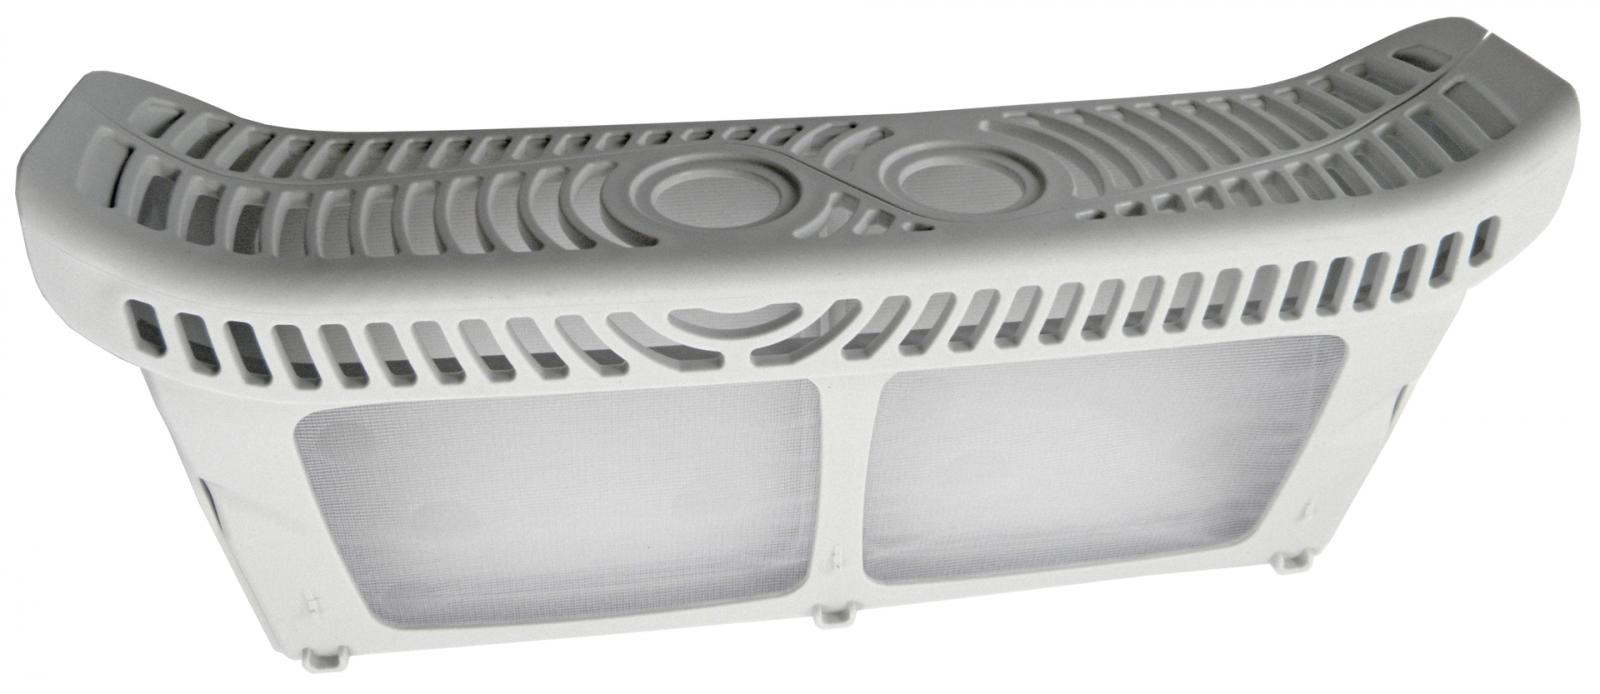 Vzduchový filtr do sušičky Whirlpool - C00286864 Whirlpool / Indesit